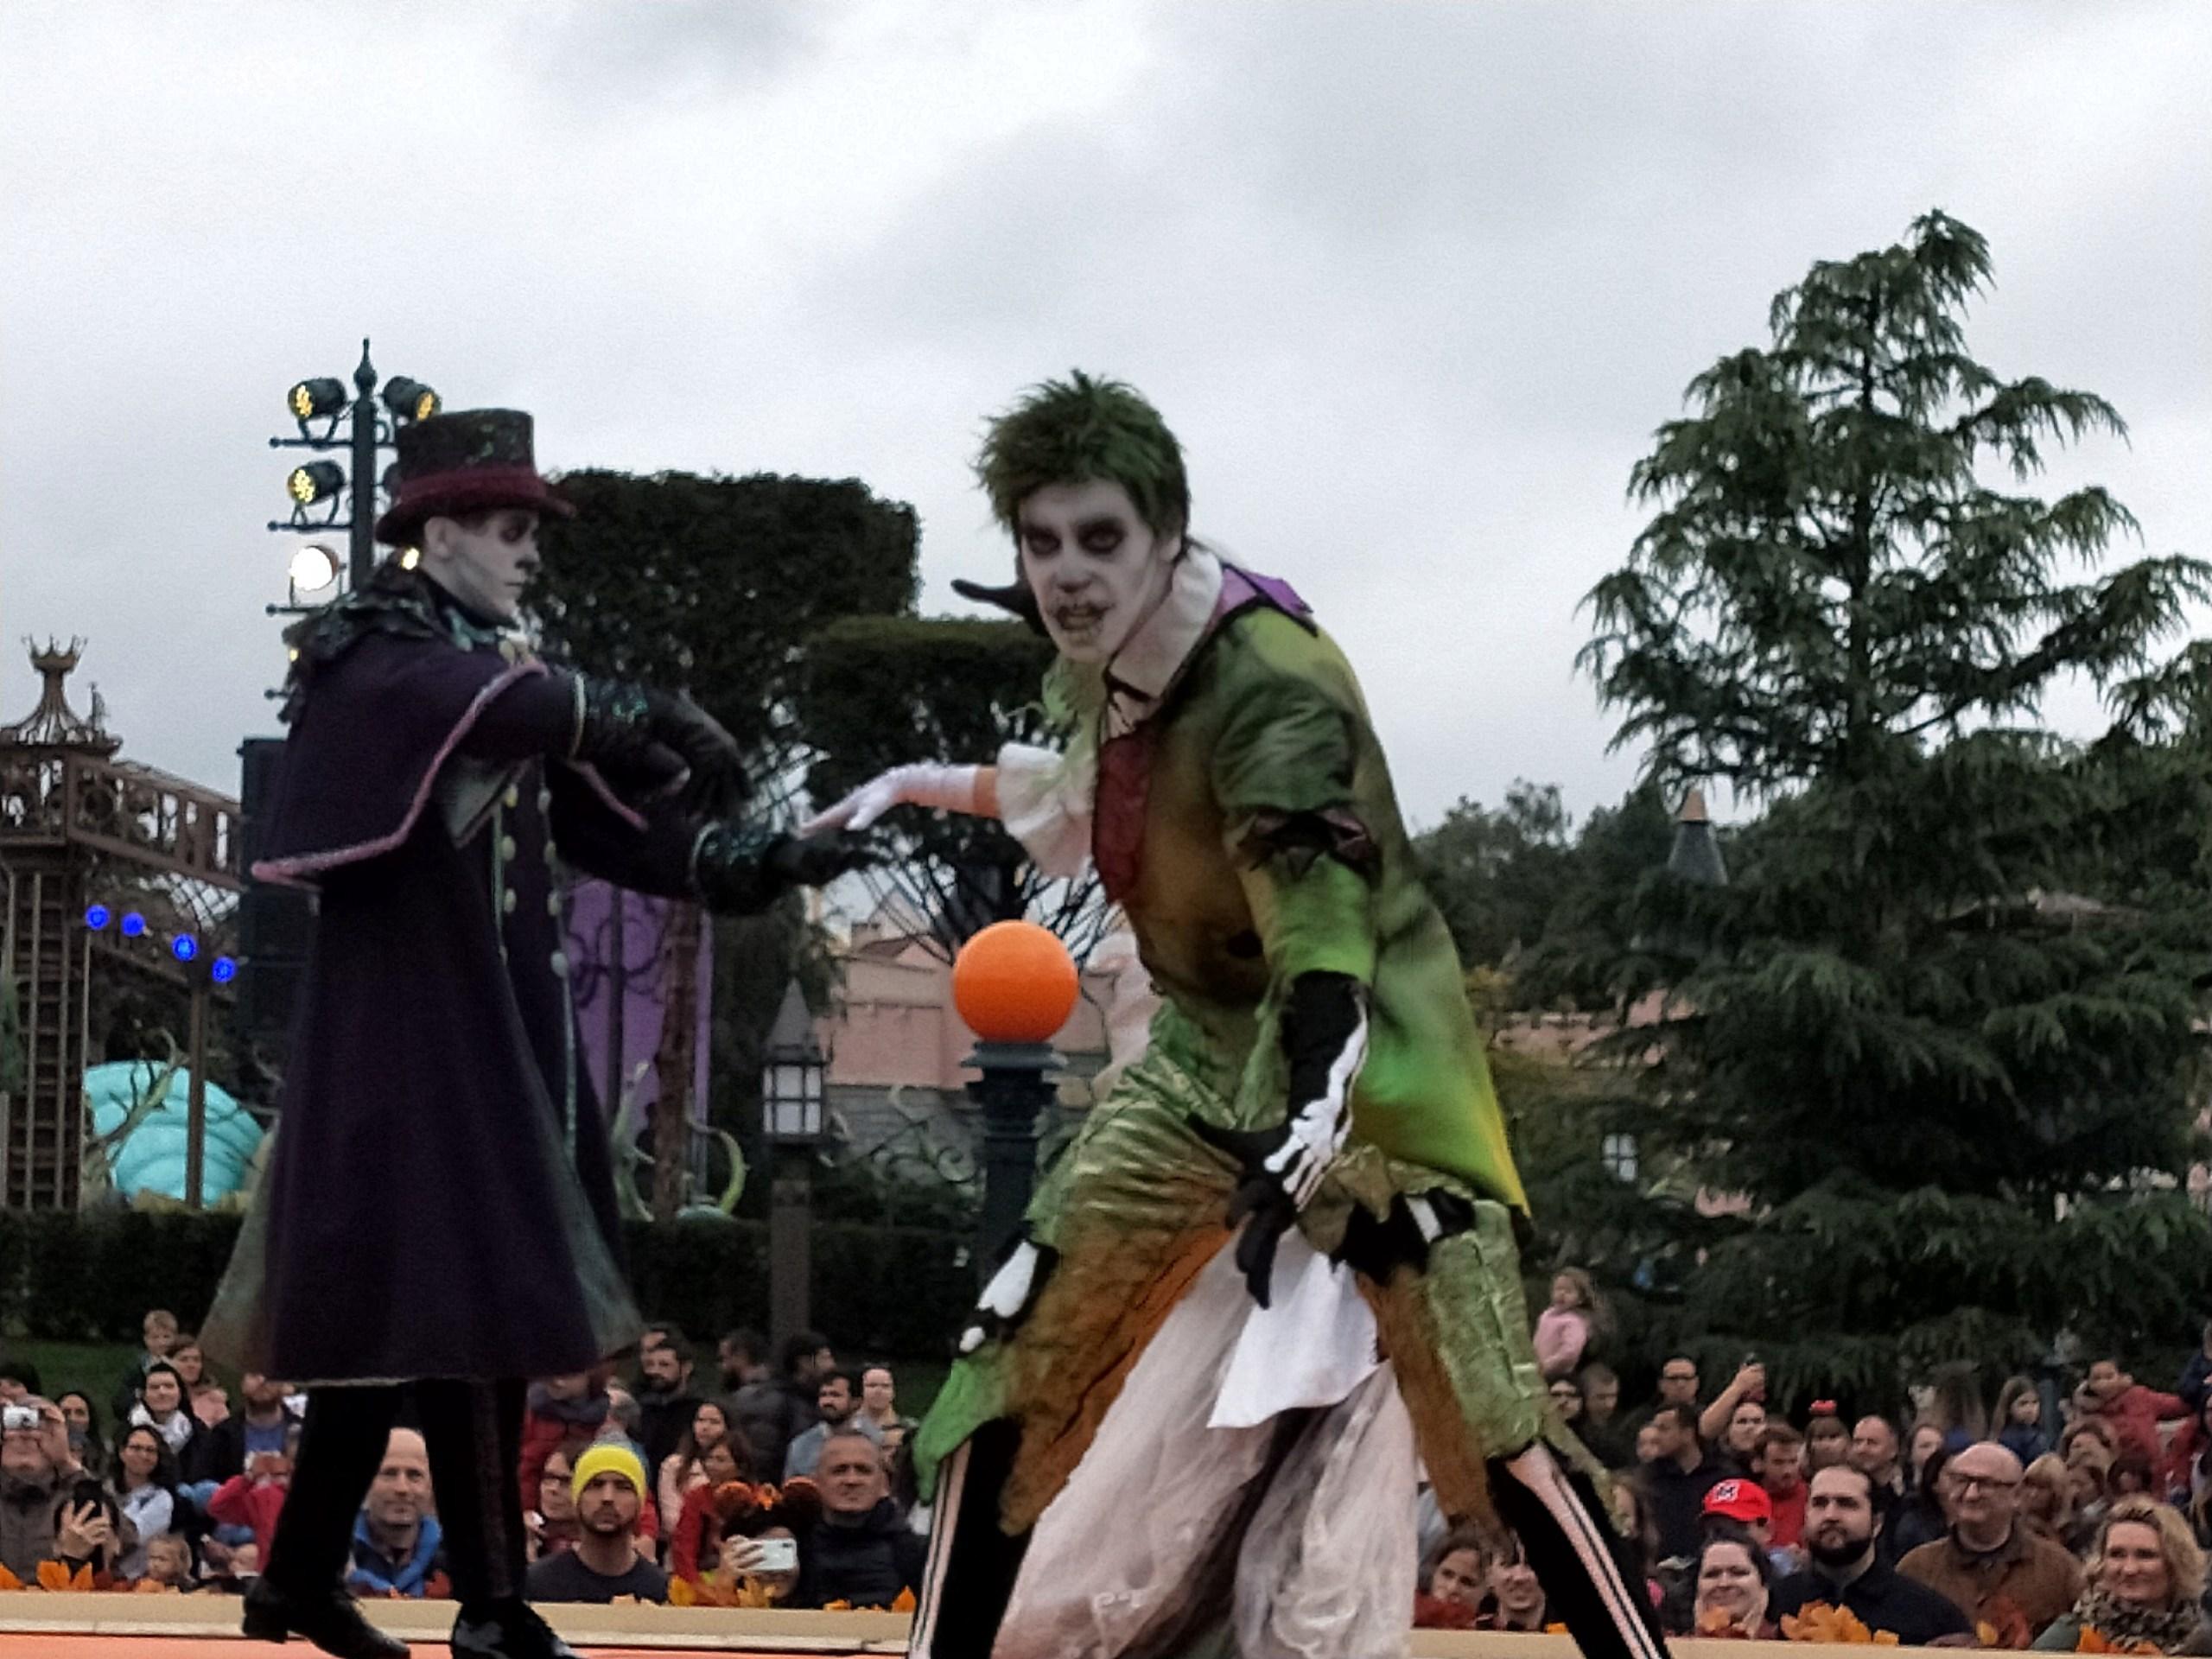 2019 - Festival Halloween Disney - Pagina 5 Img20126